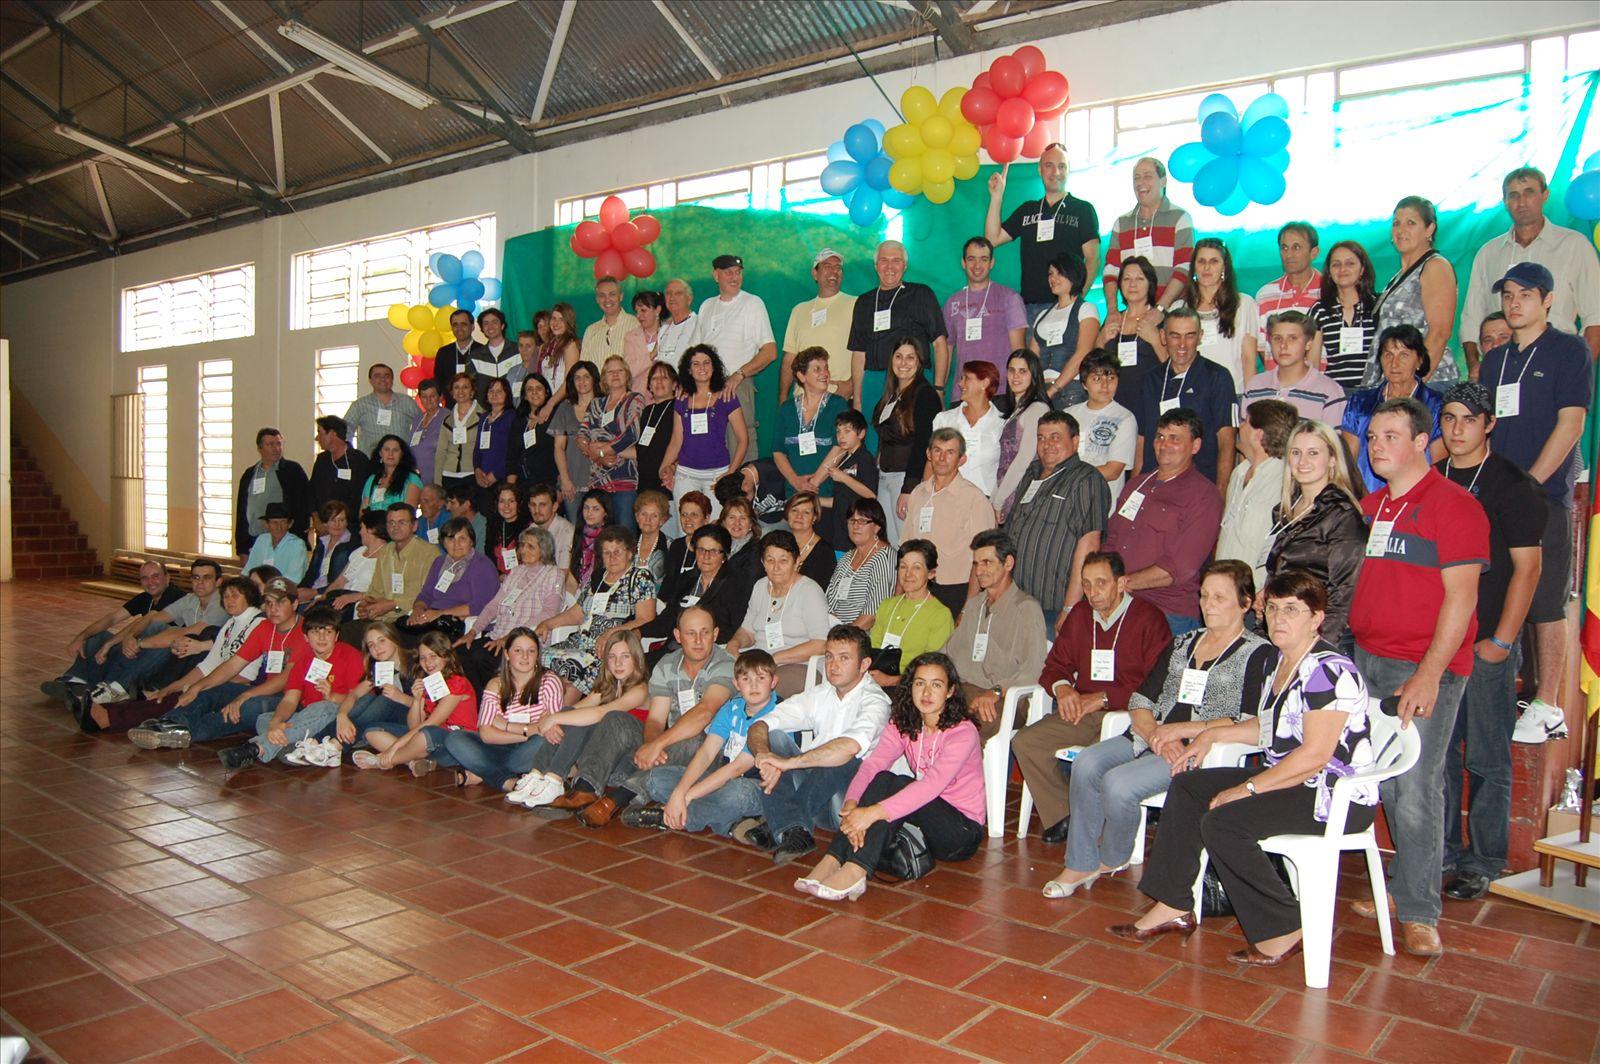 2º Encontro Família Cornelli - 11.10.2009 (170)_0